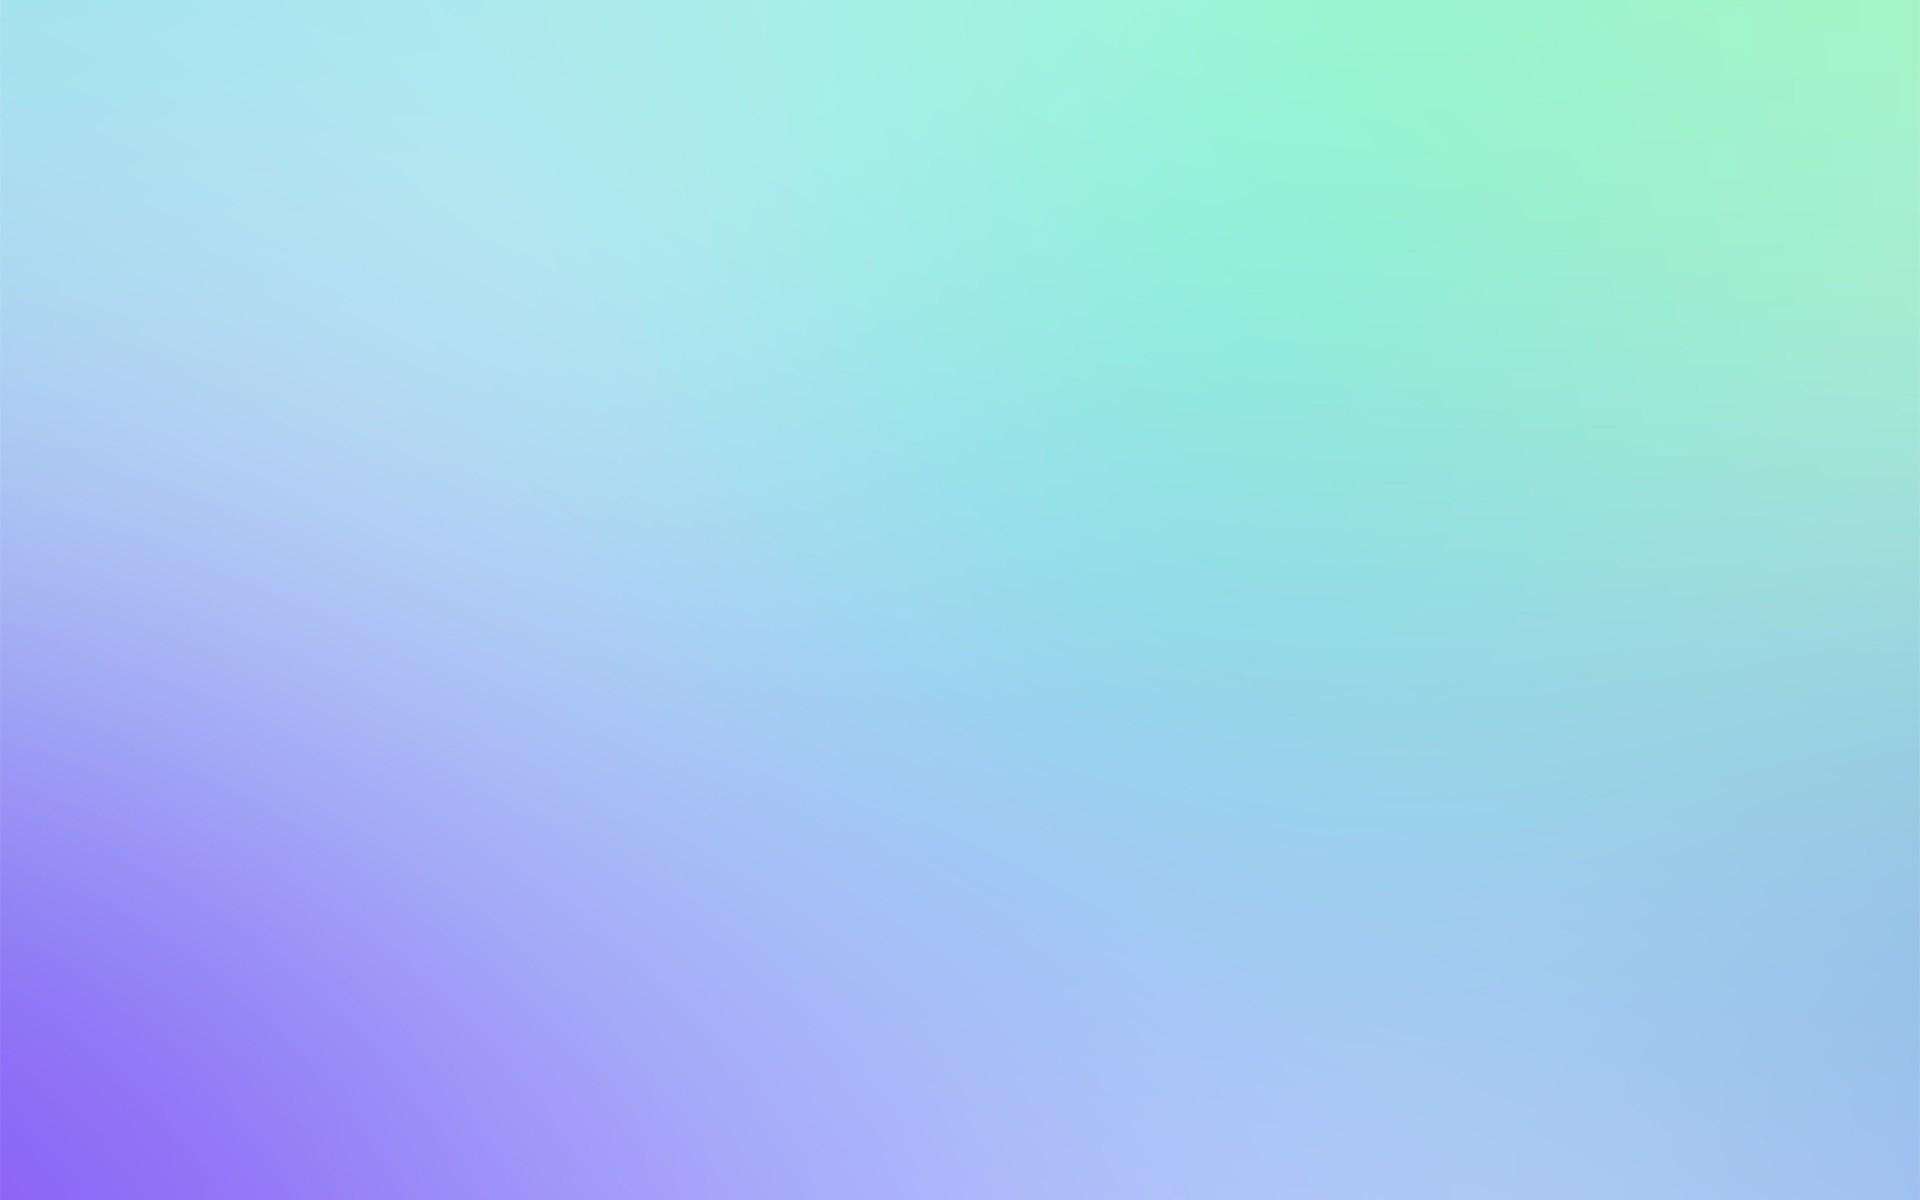 Blur Background 183 '� Download Free Stunning Full Hd